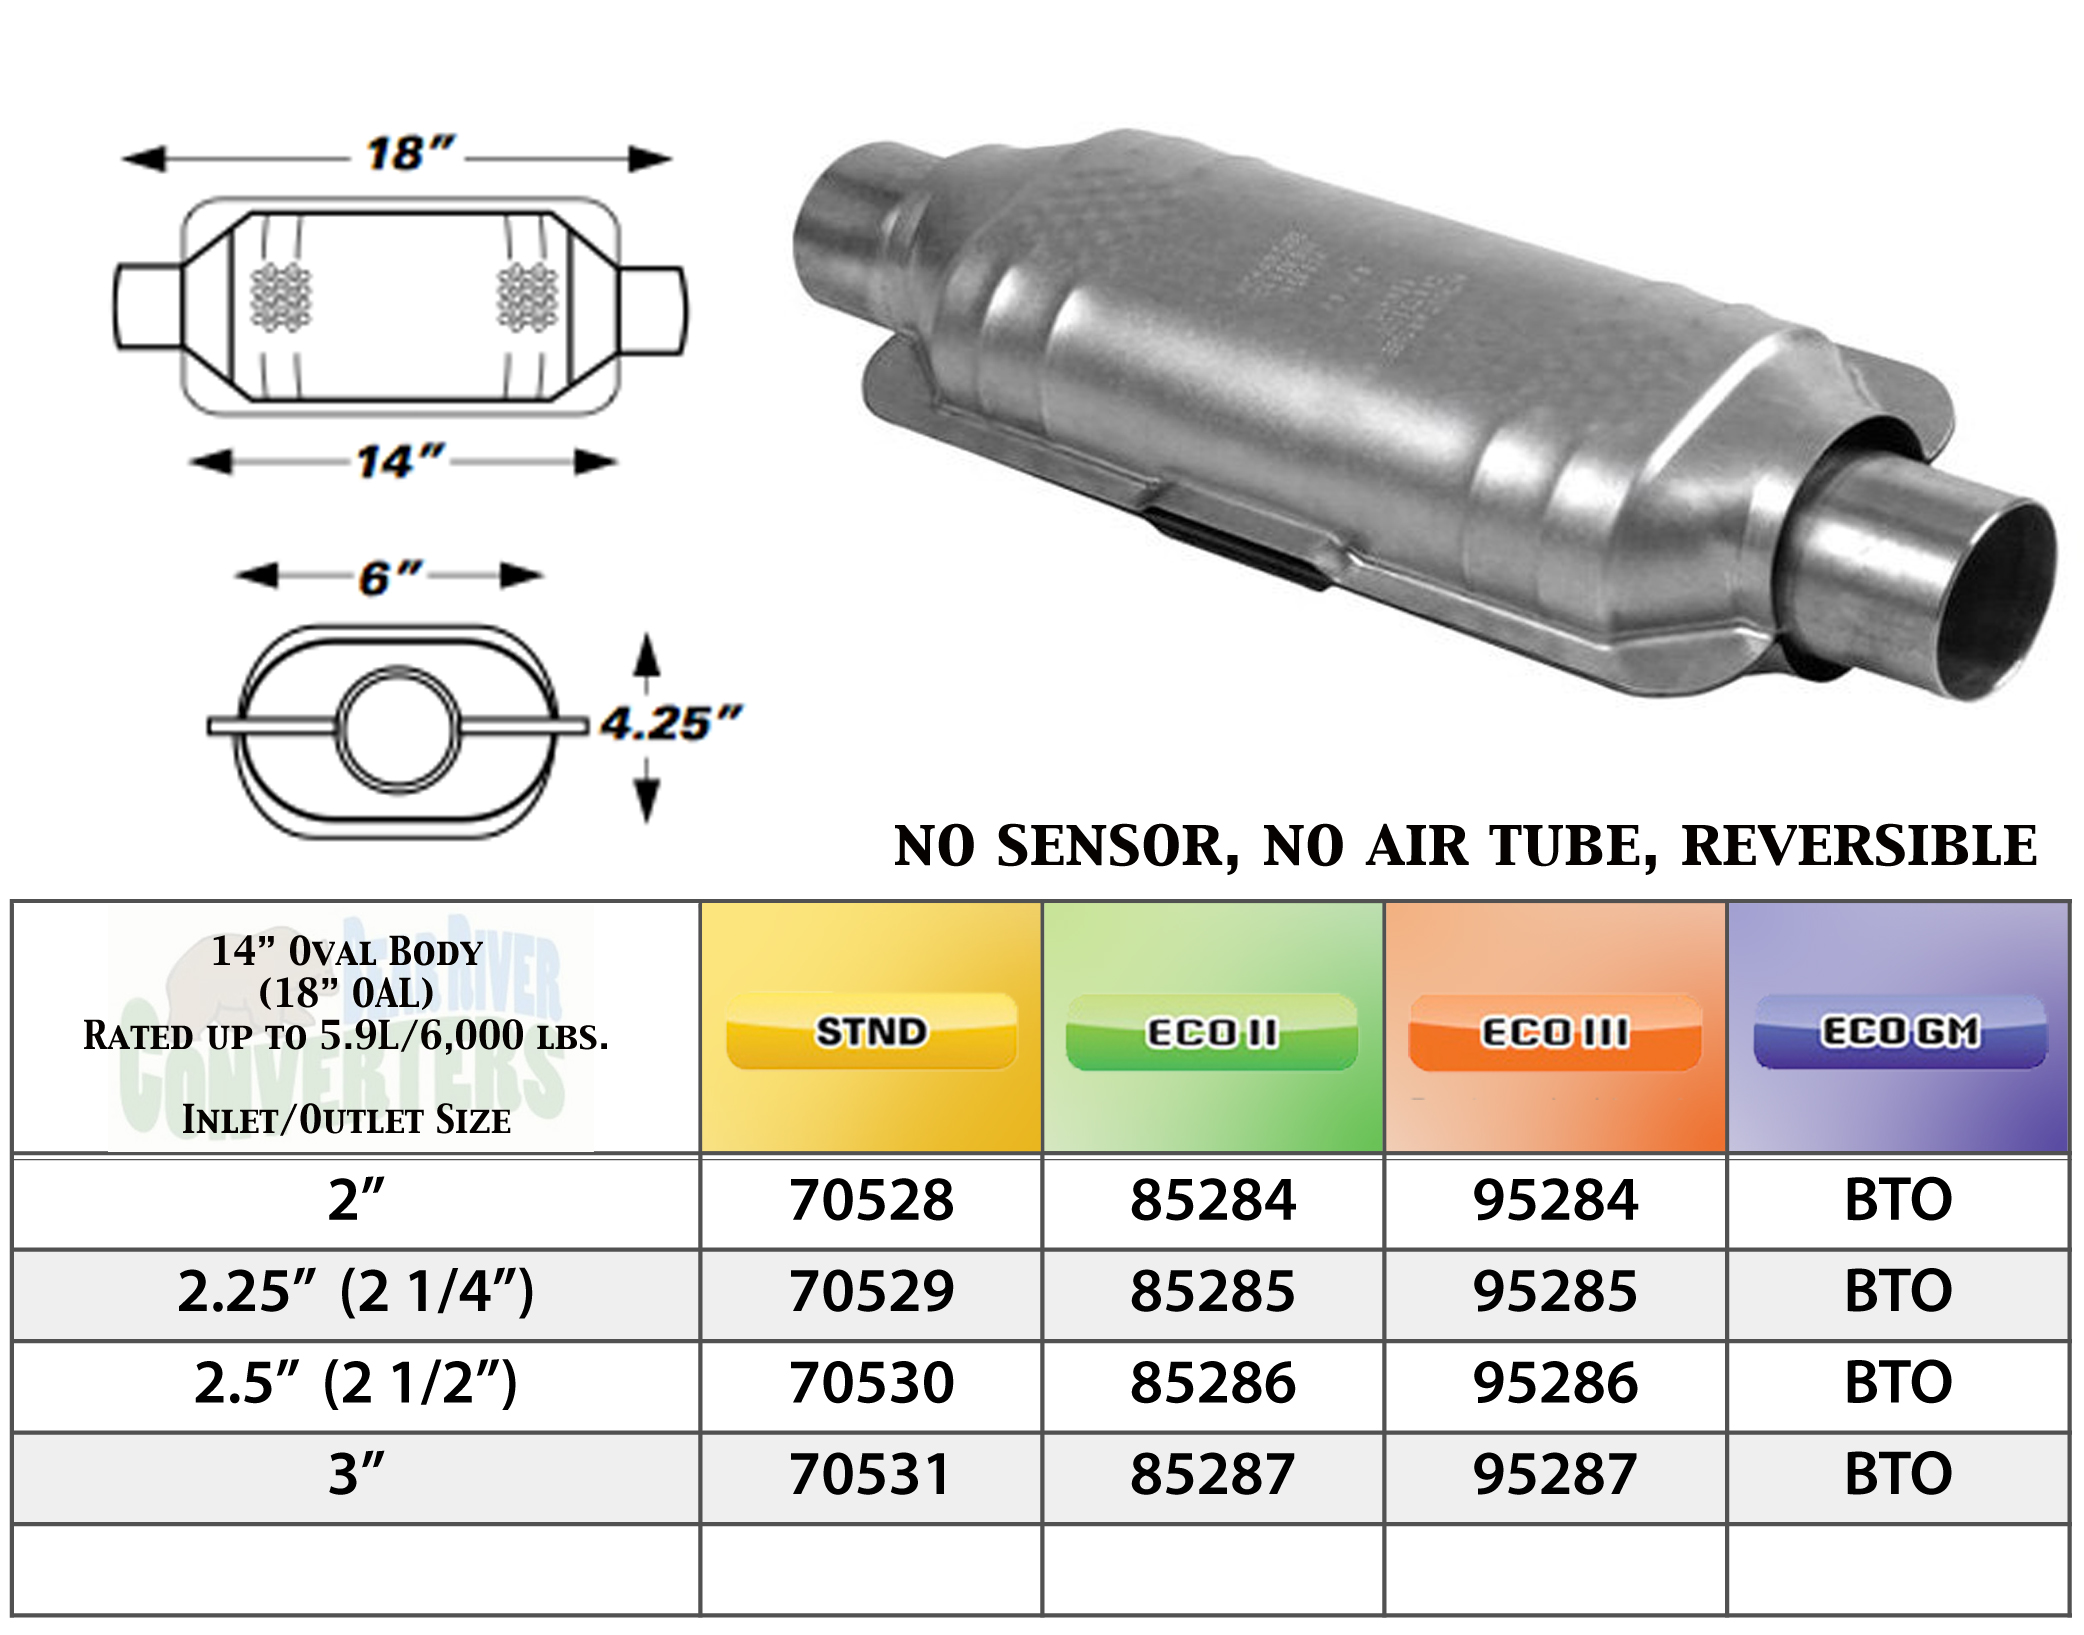 "Eastern 82256 Universal Catalytic Converter ECO II 2.5"" Pipe 6"" Bullet Body"